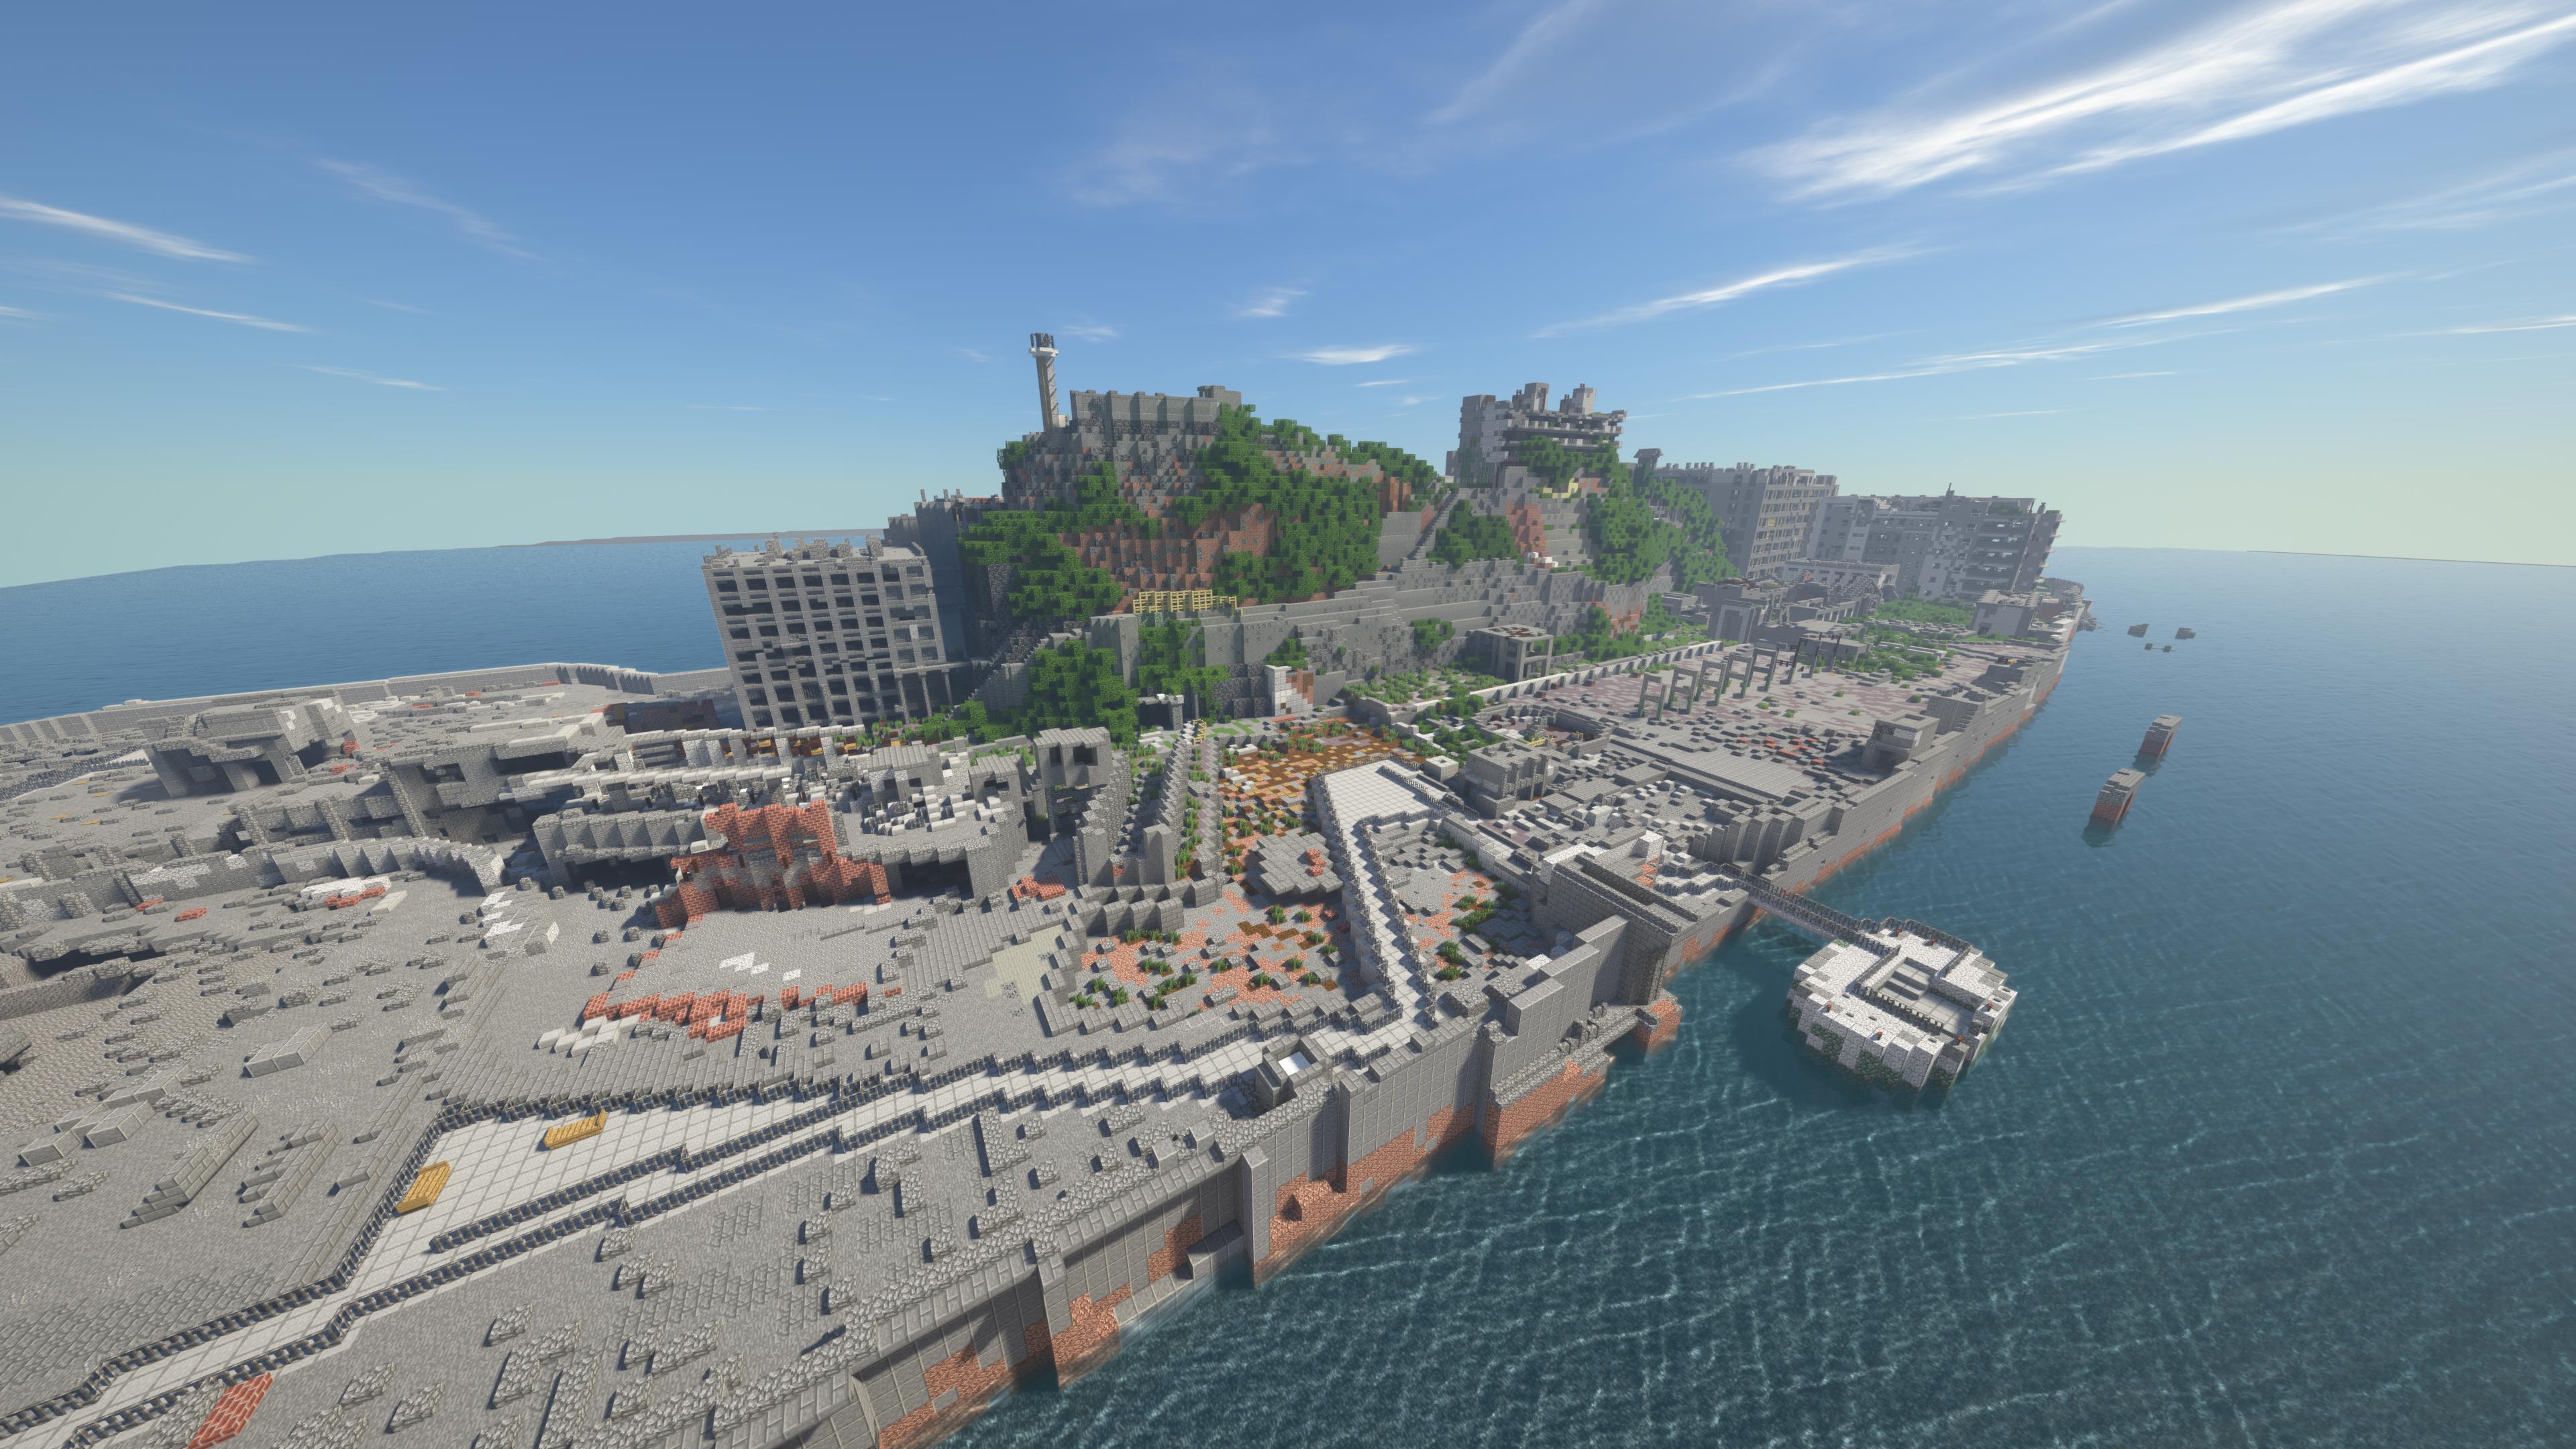 Minecraftで制作した1/1スケールの軍艦島。かとりく氏のTwitter(@land_ineraf37)でJava版、スマホ版の両方のワールドデータが配布されている